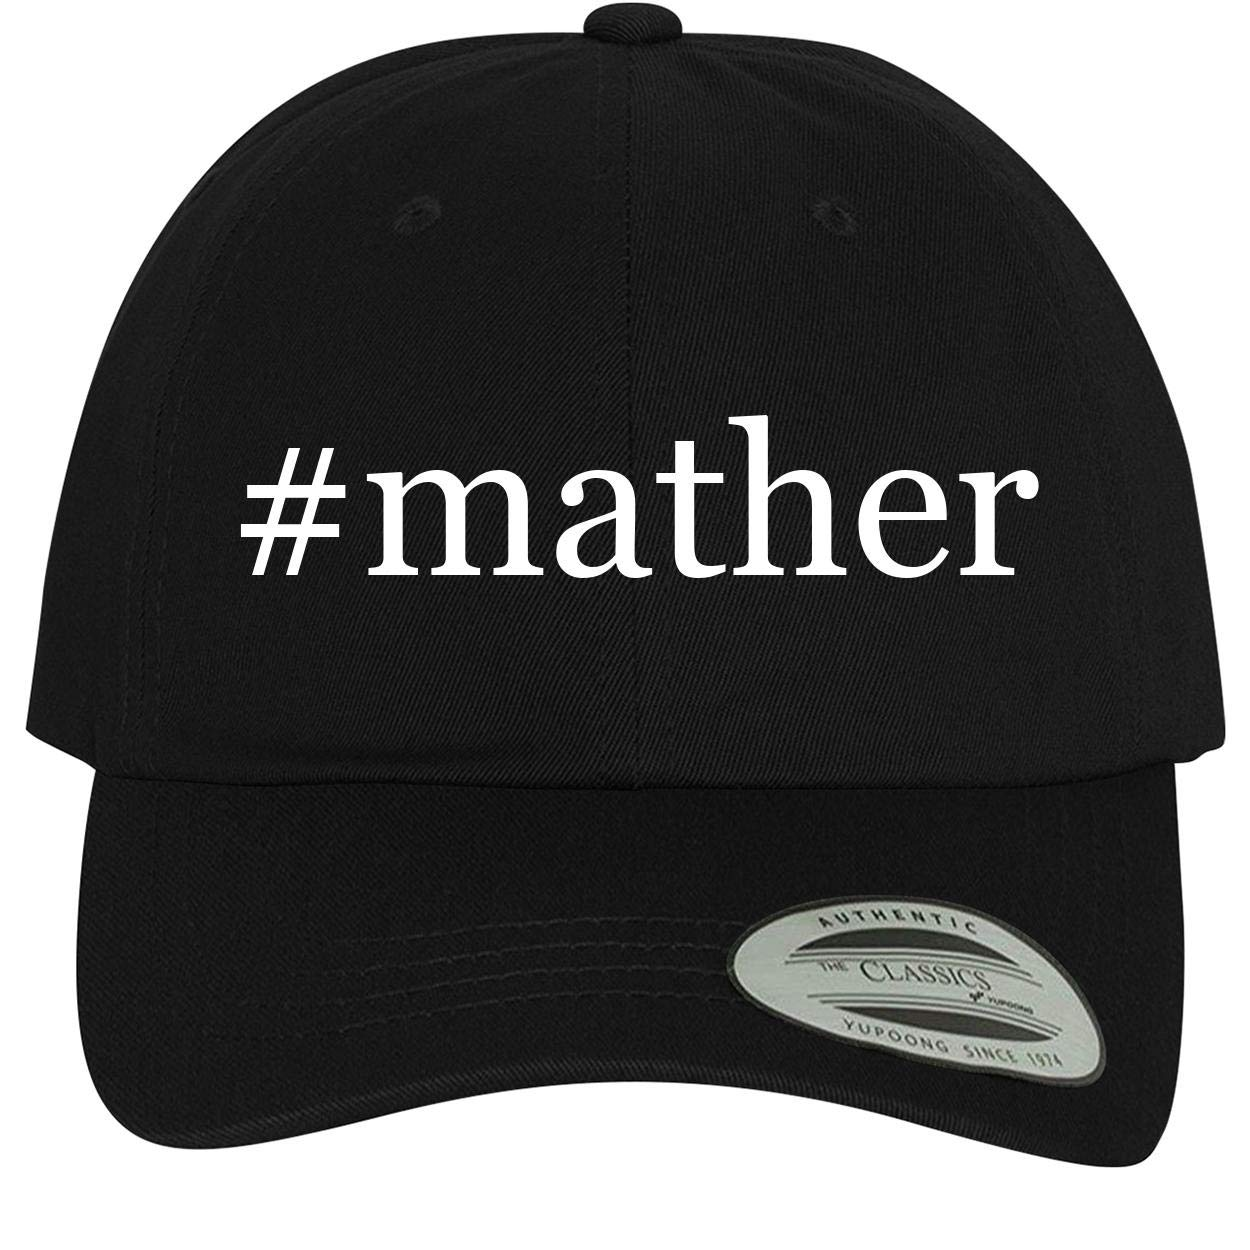 Comfortable Dad Hat Baseball Cap BH Cool Designs #Mather